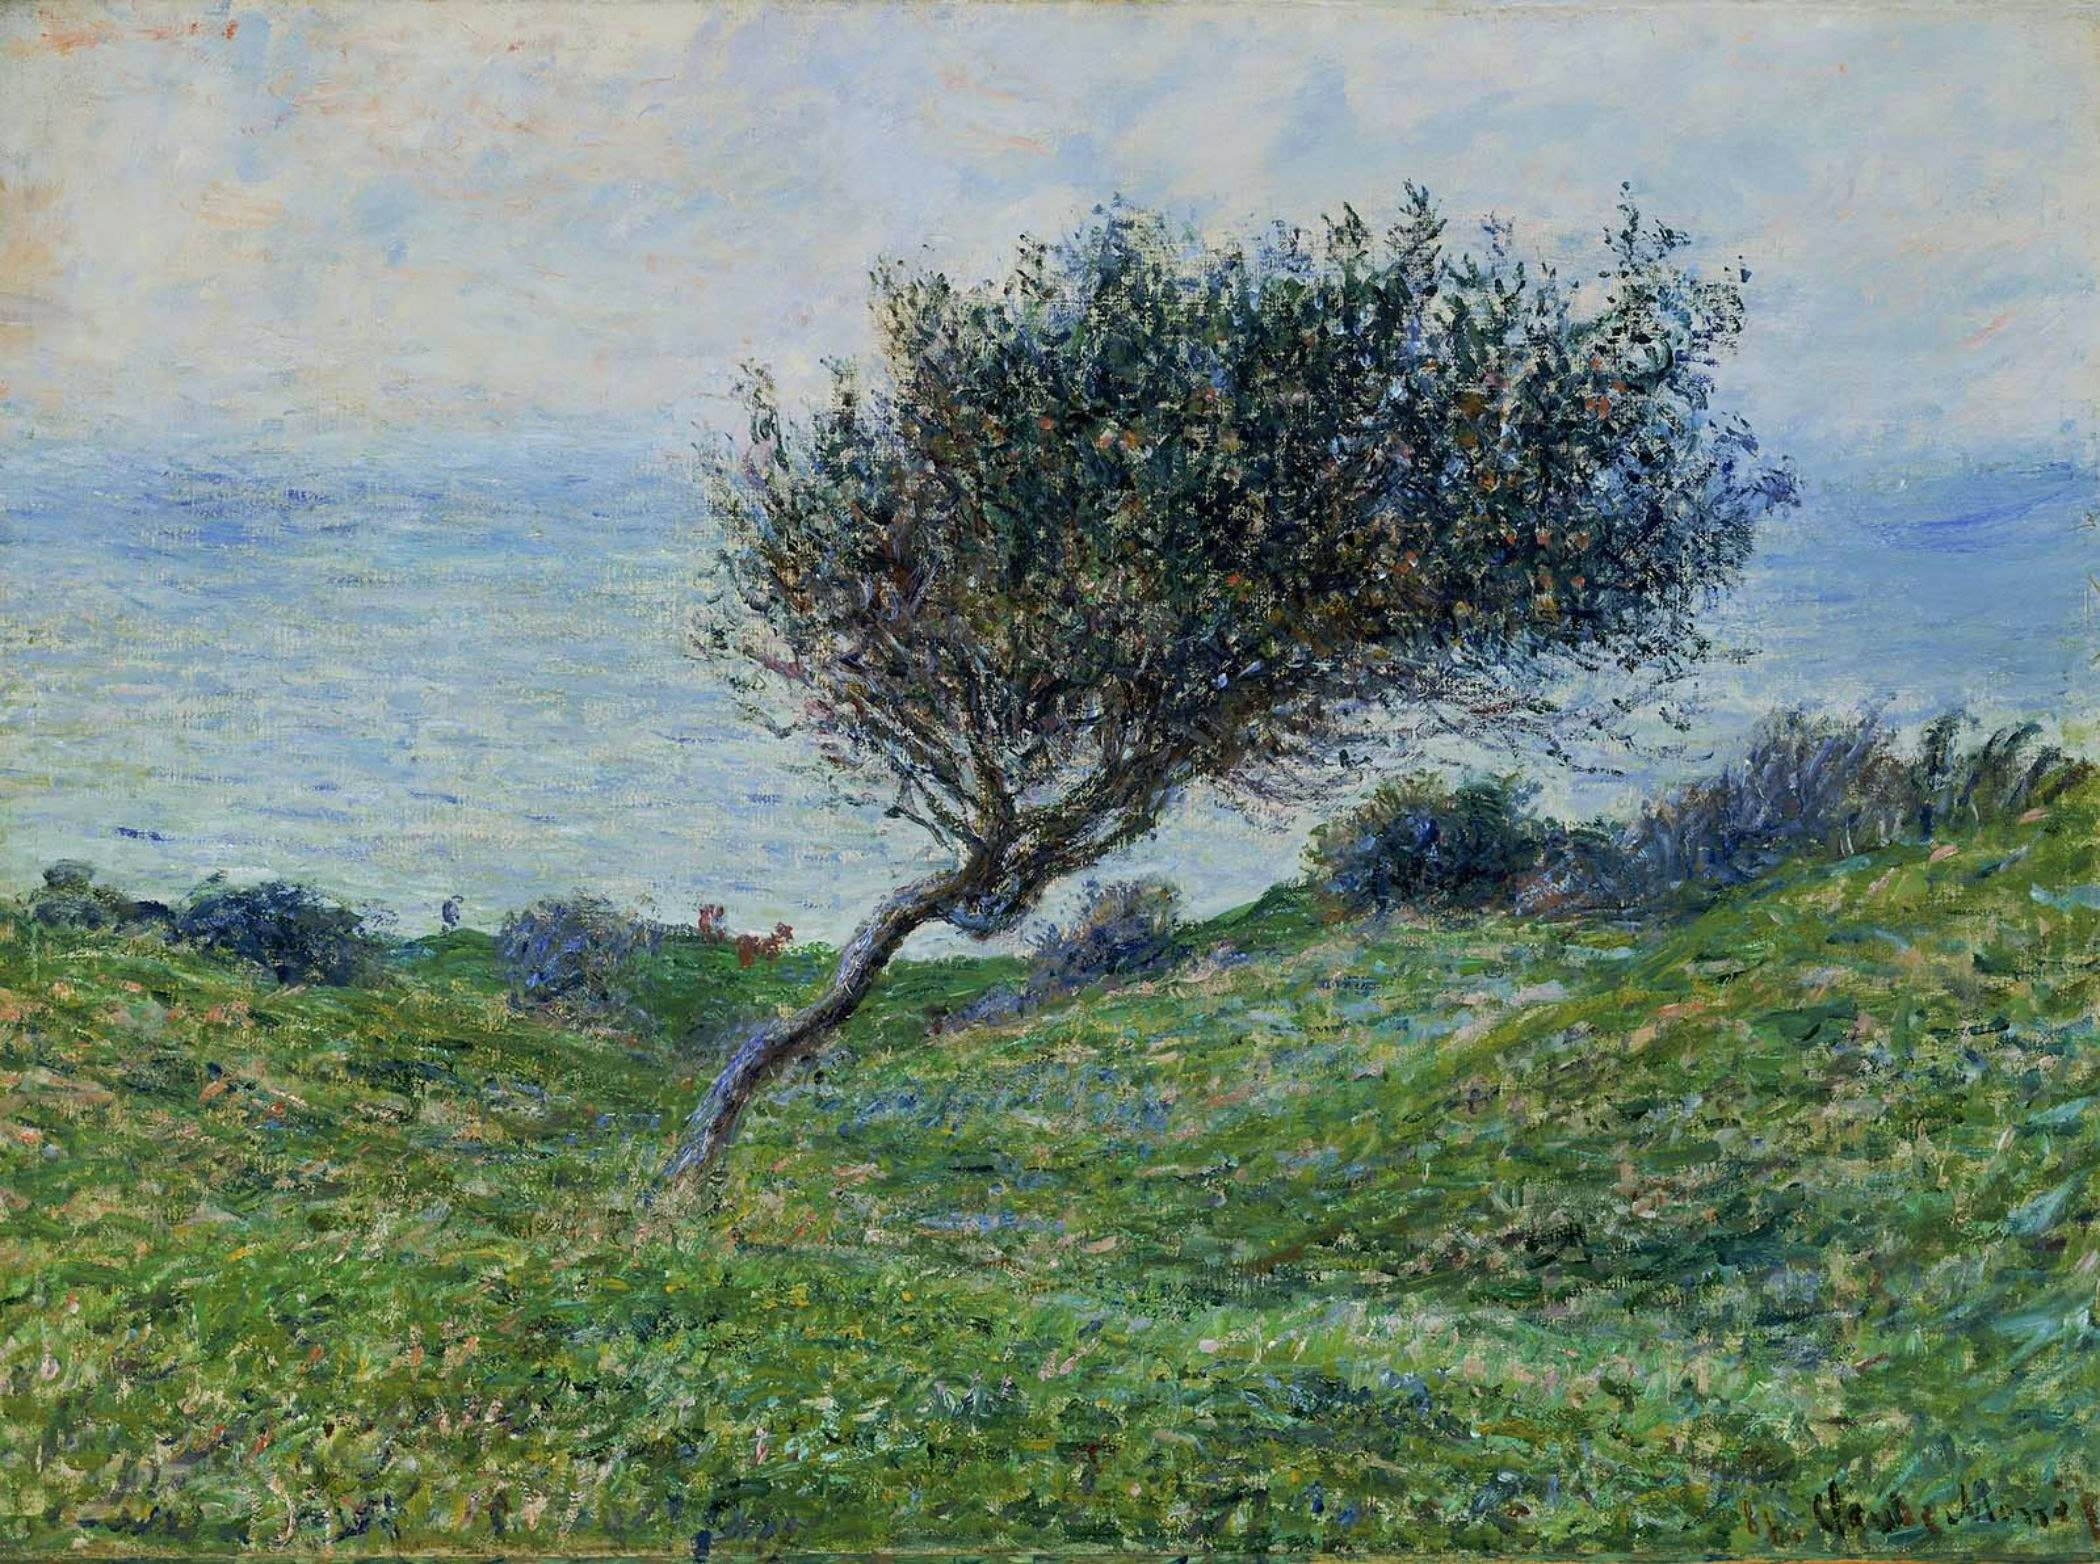 ������ < �� ������� ��������� � ������� >:: ���� ����, �������� ������� - ���� ���� (Claude Monet) ����